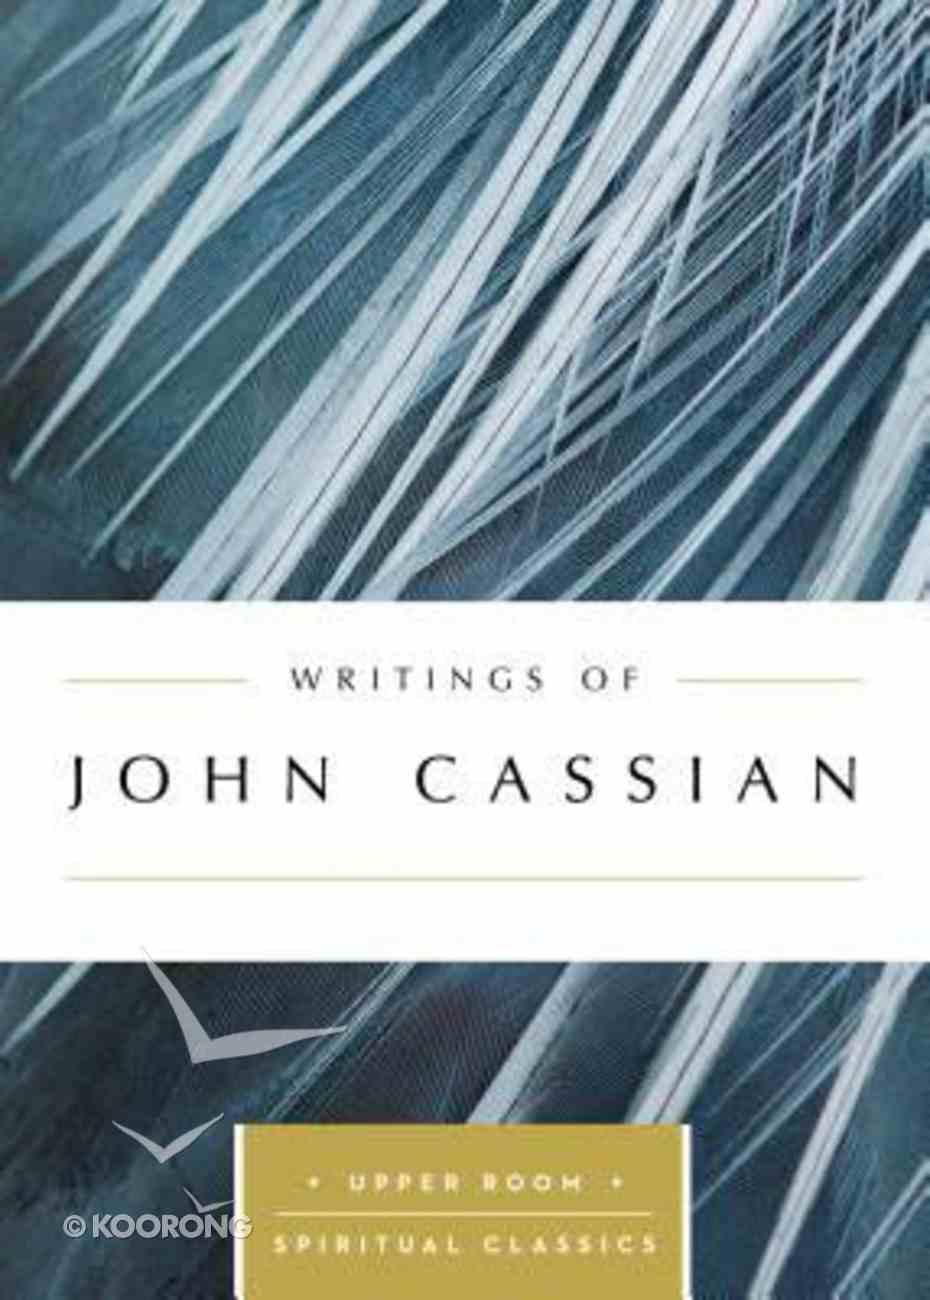 Writings of John Cassian (Upper Room Spiritual Classics Series) Paperback